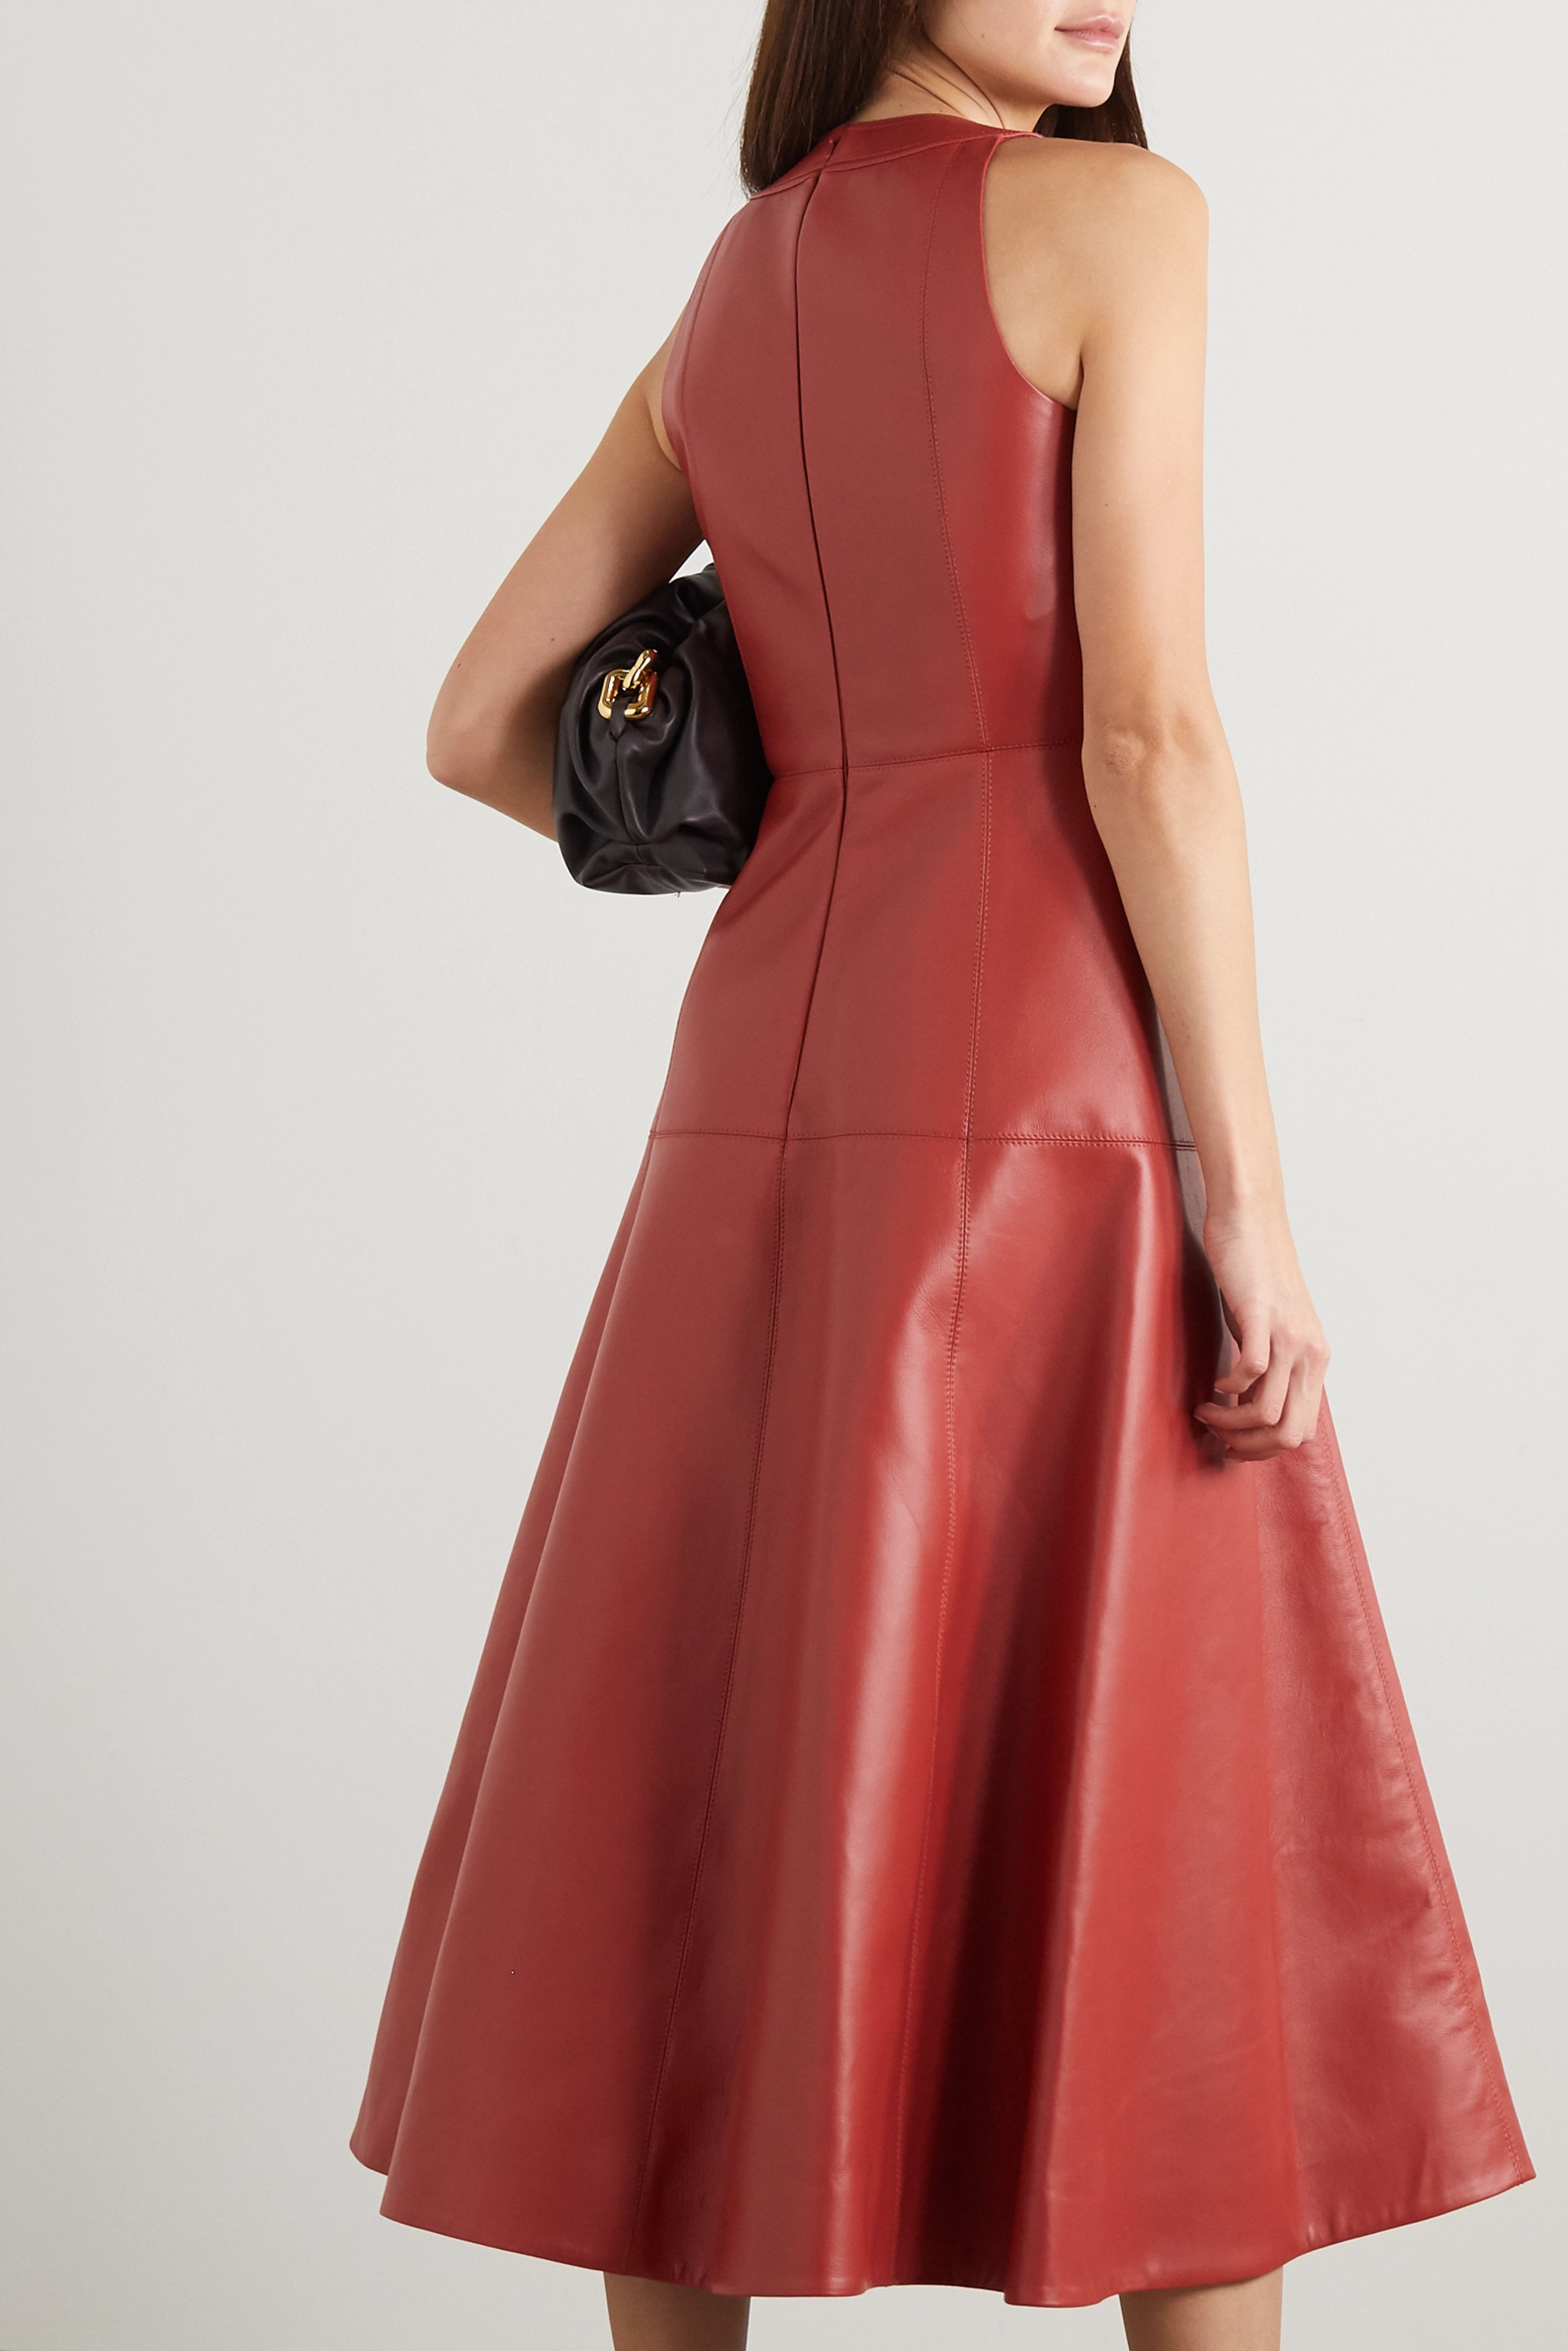 Oscar de la Renta Paneled leather midi dress